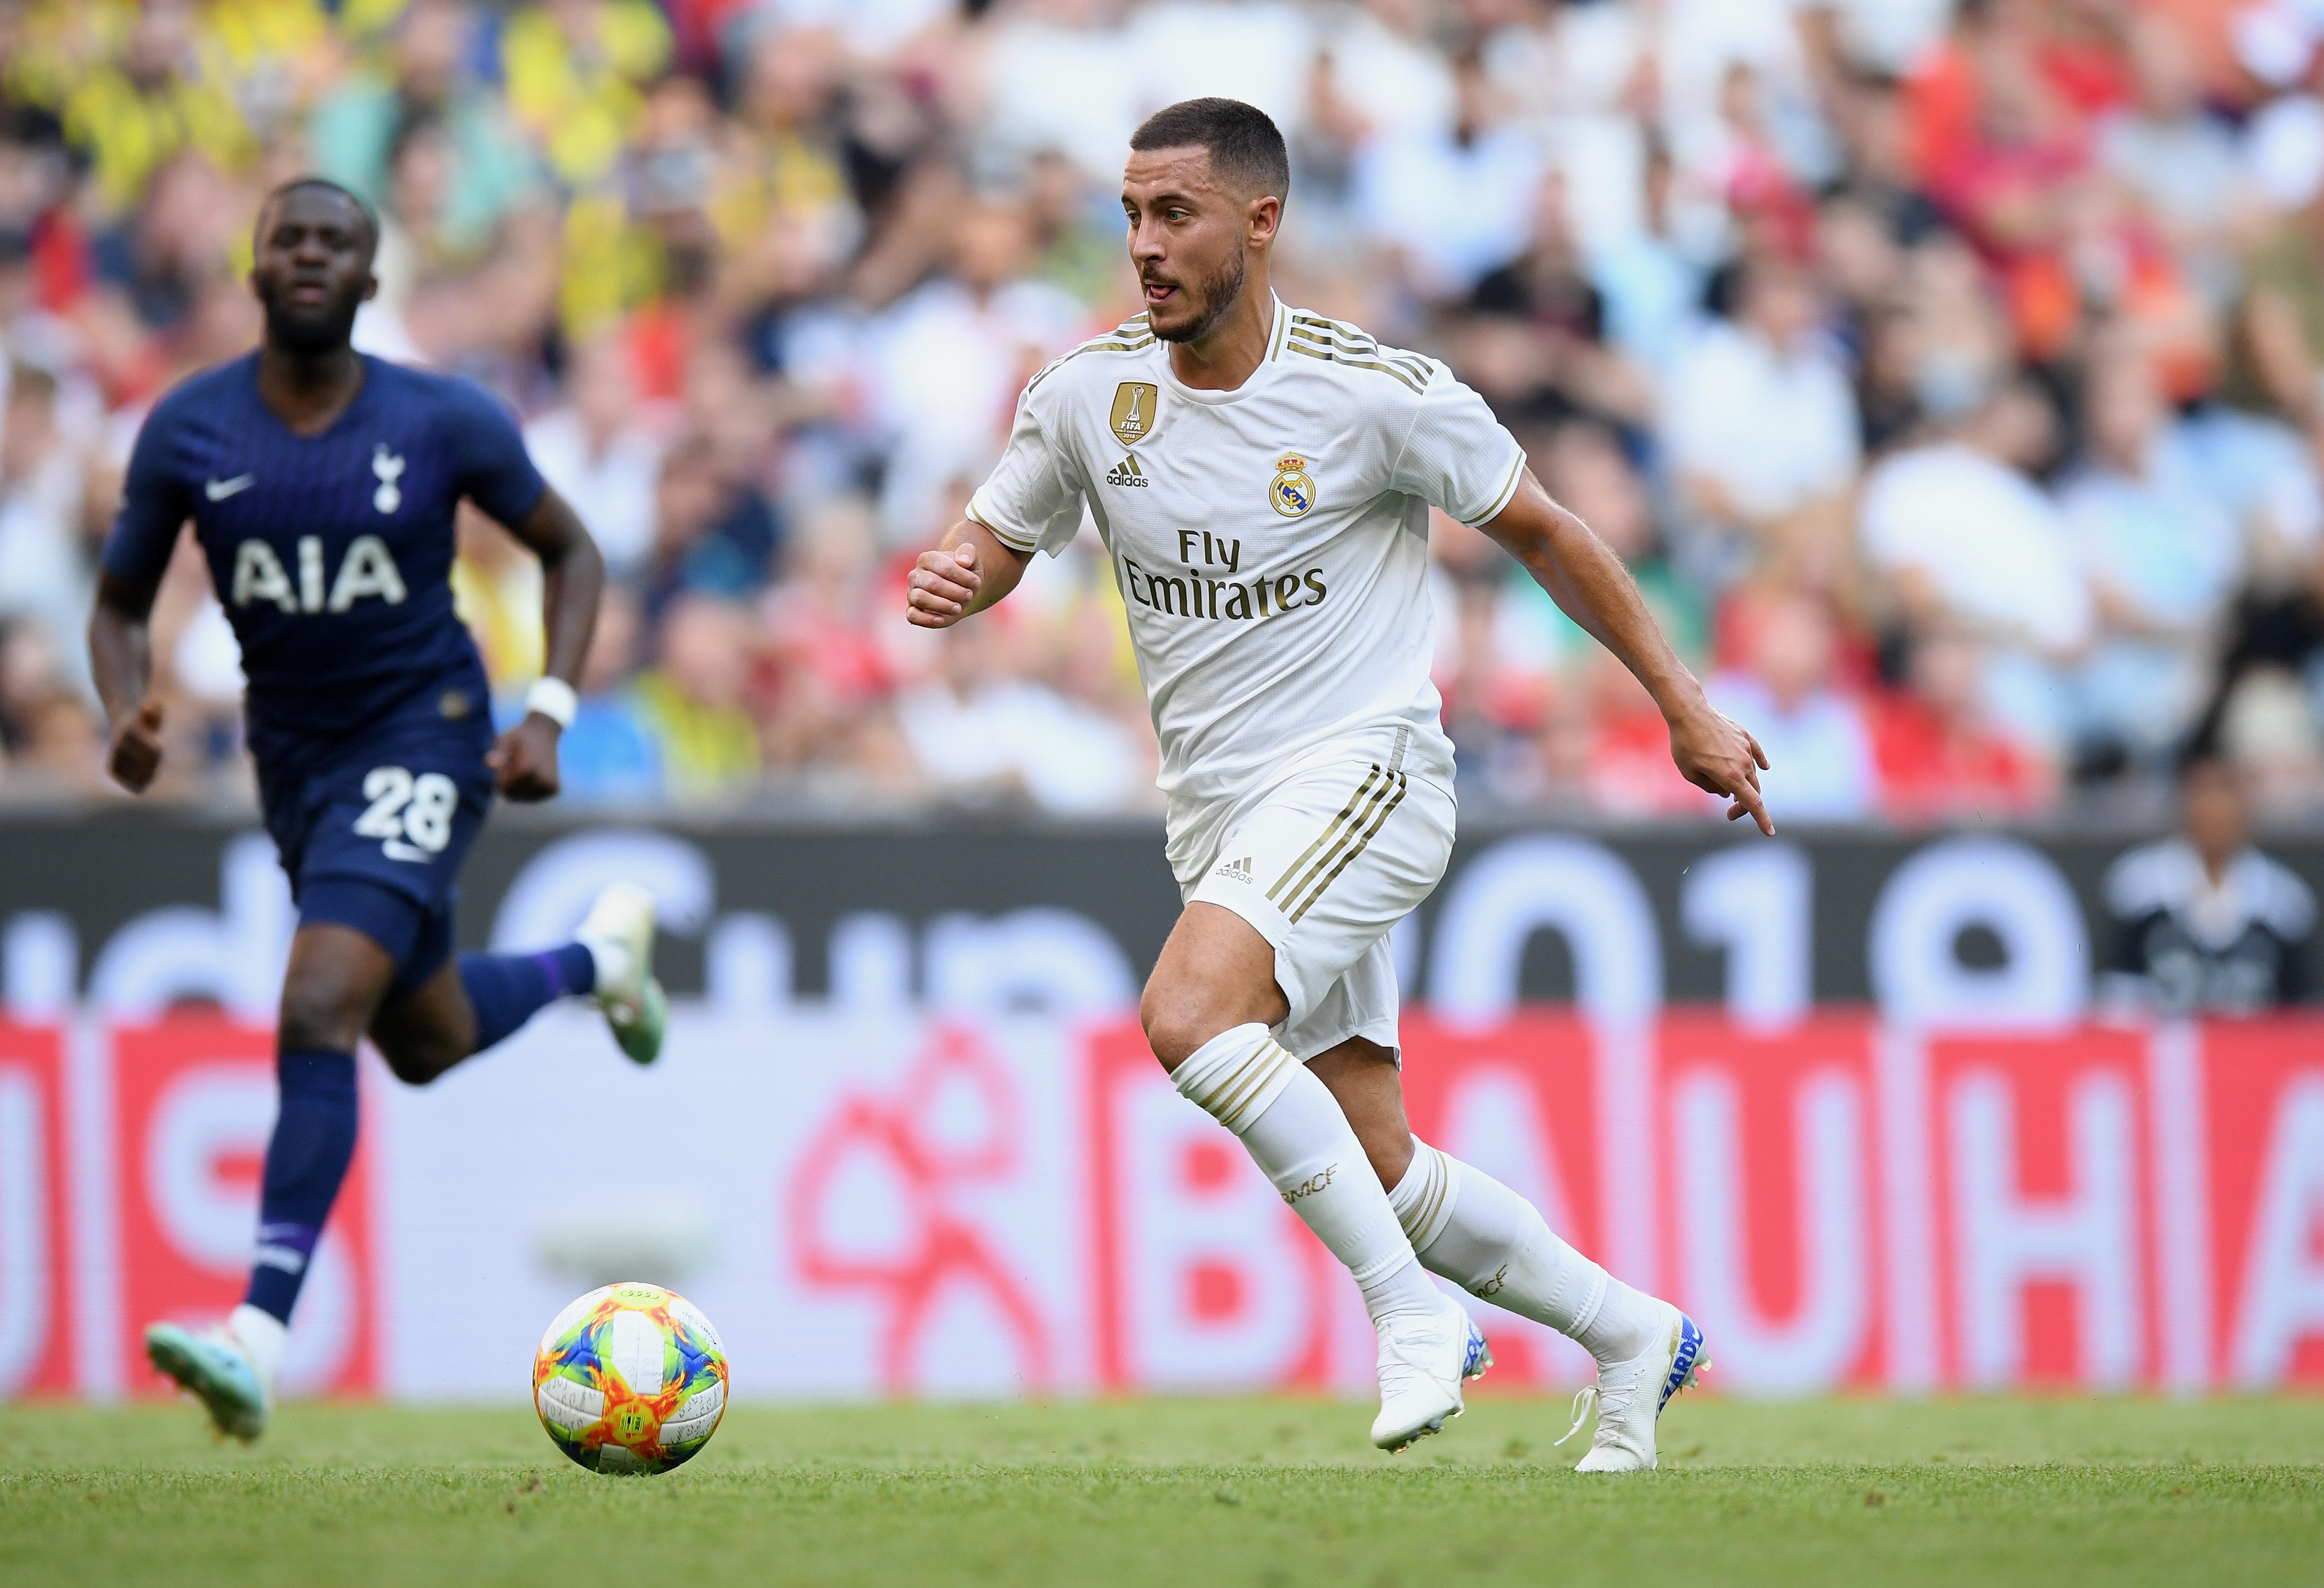 Celta Vigo-Real Madrid, occhi puntati sui blancos